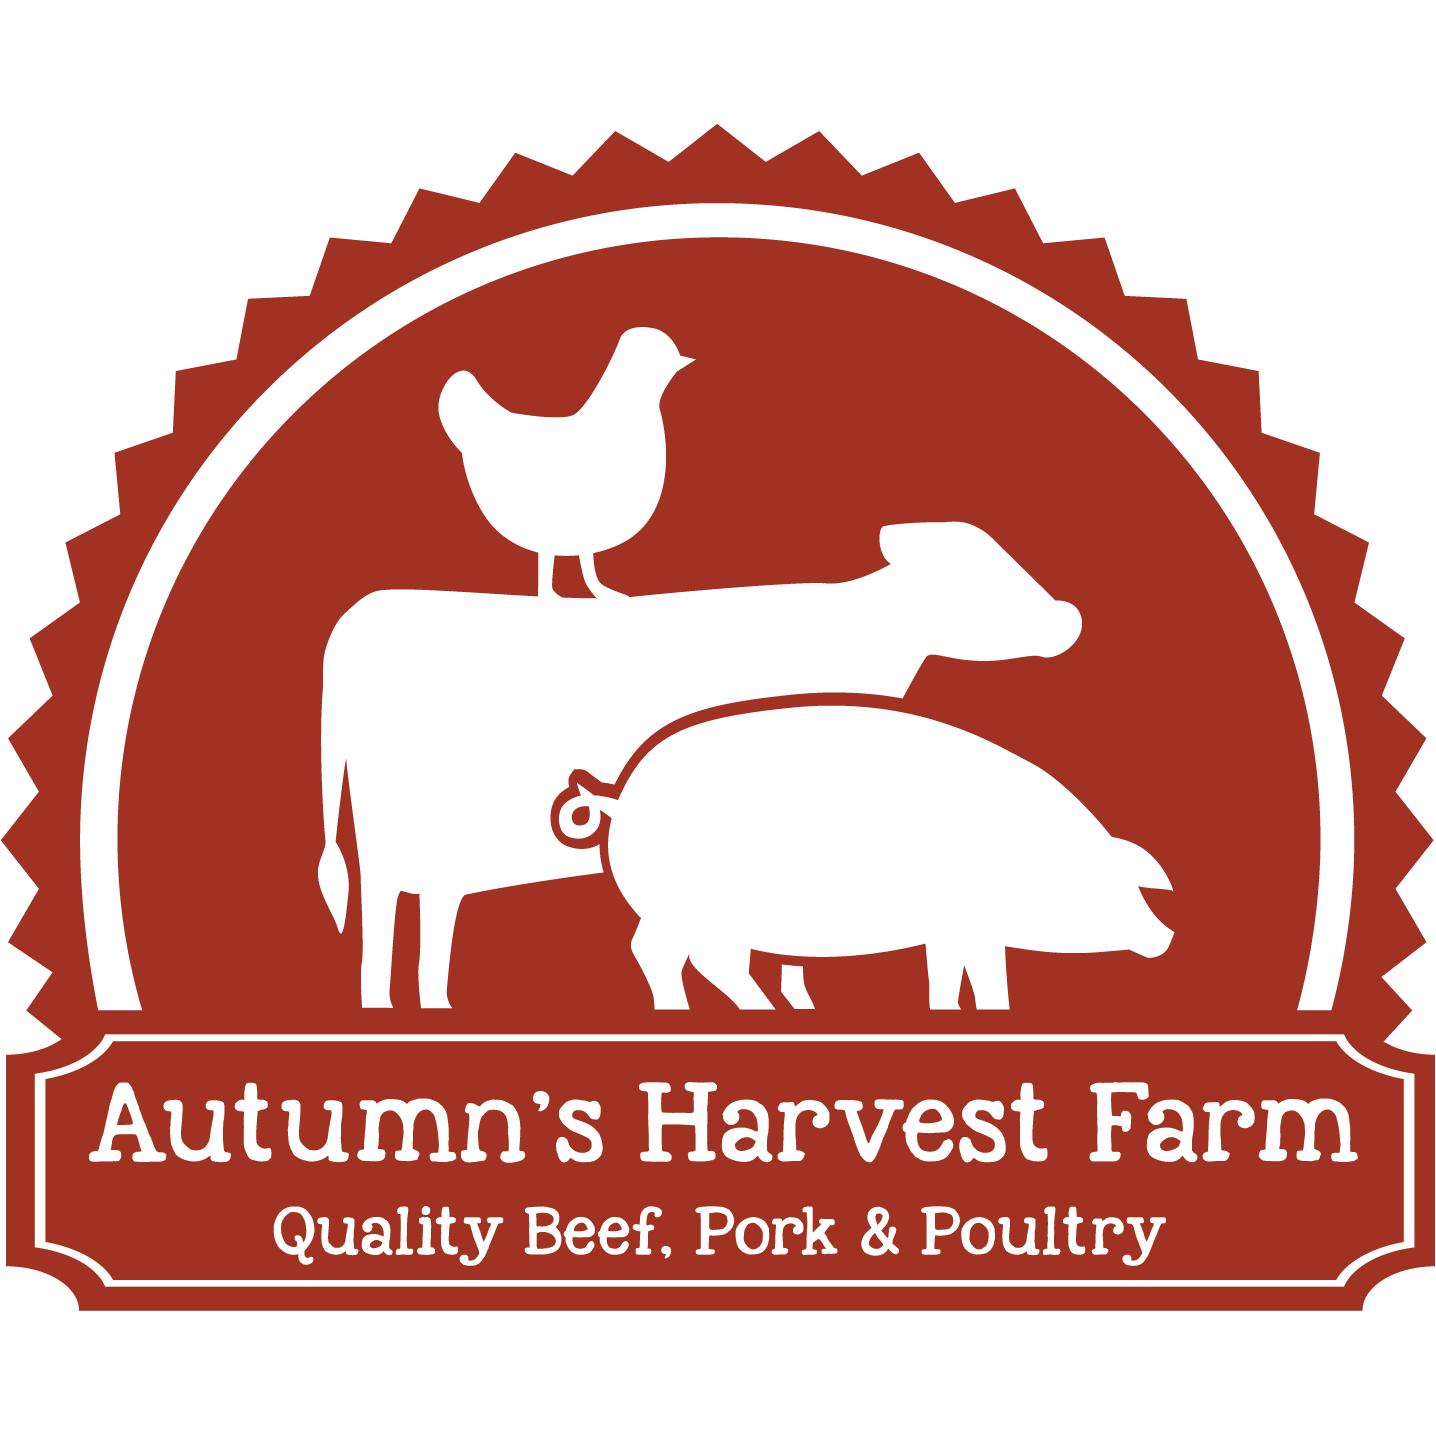 Autumn's Harvest Farm